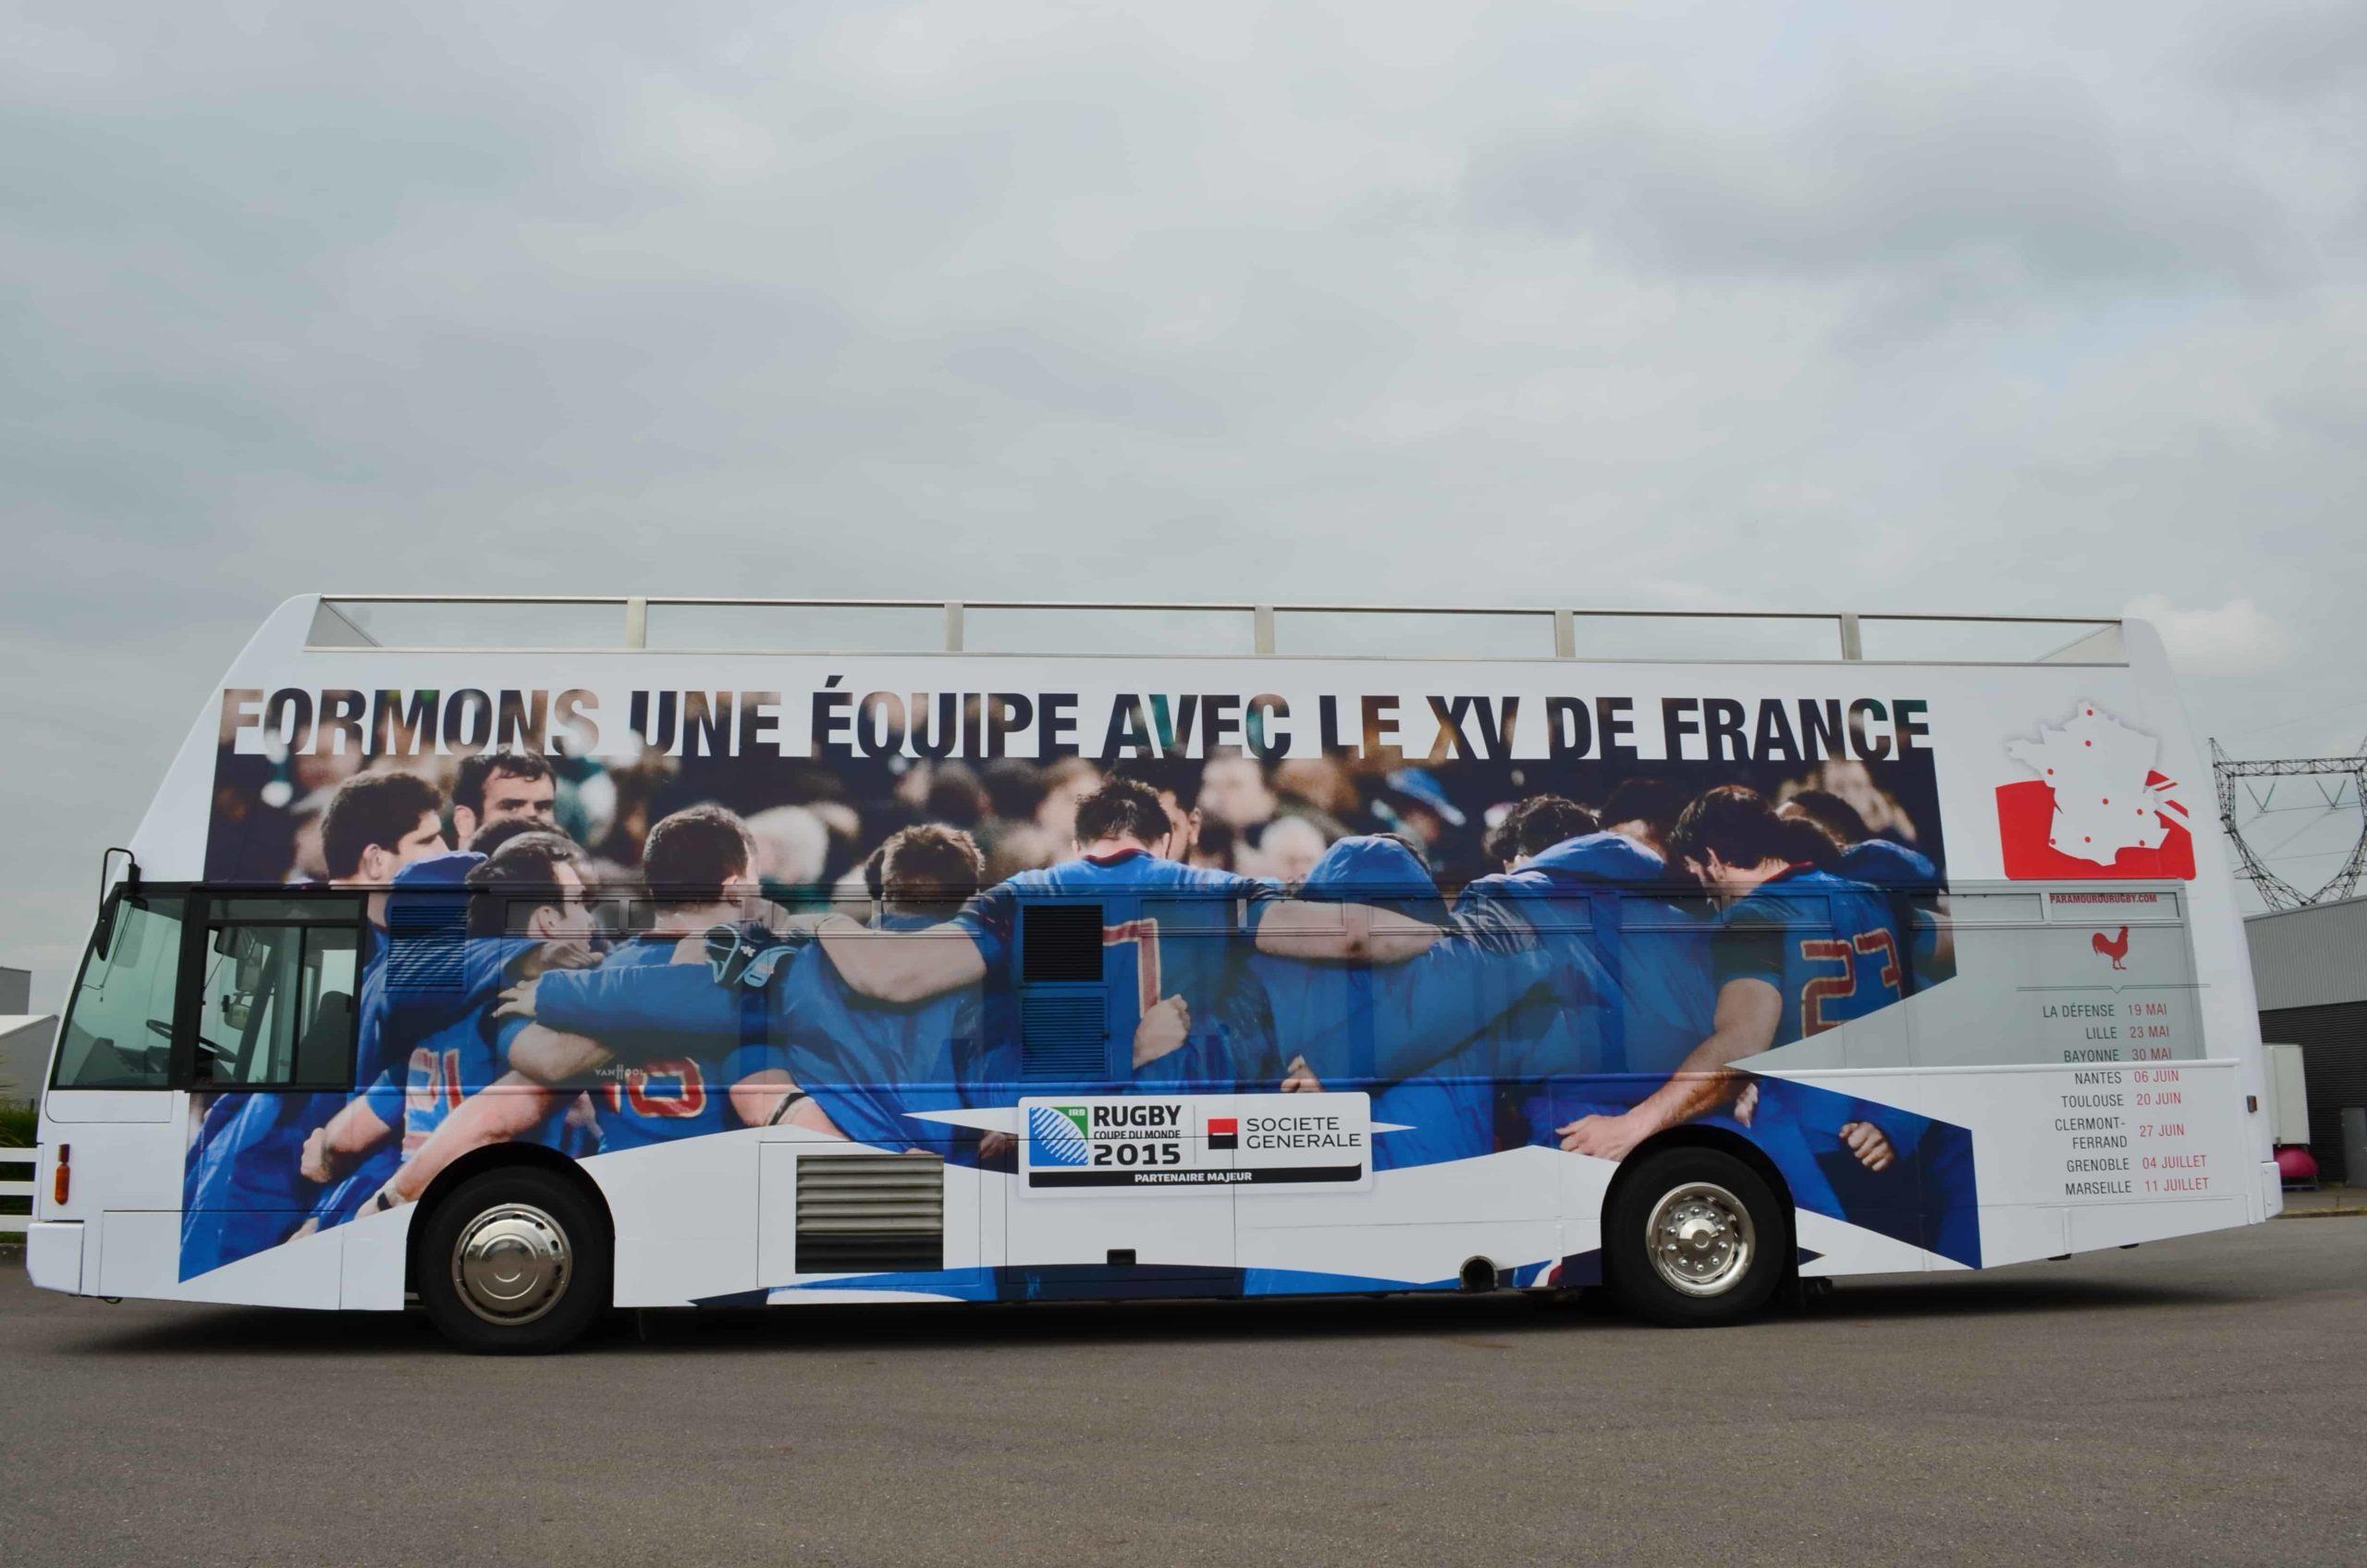 Vans Chardron Véhicule evenementiel Bus rugby avec terrasse